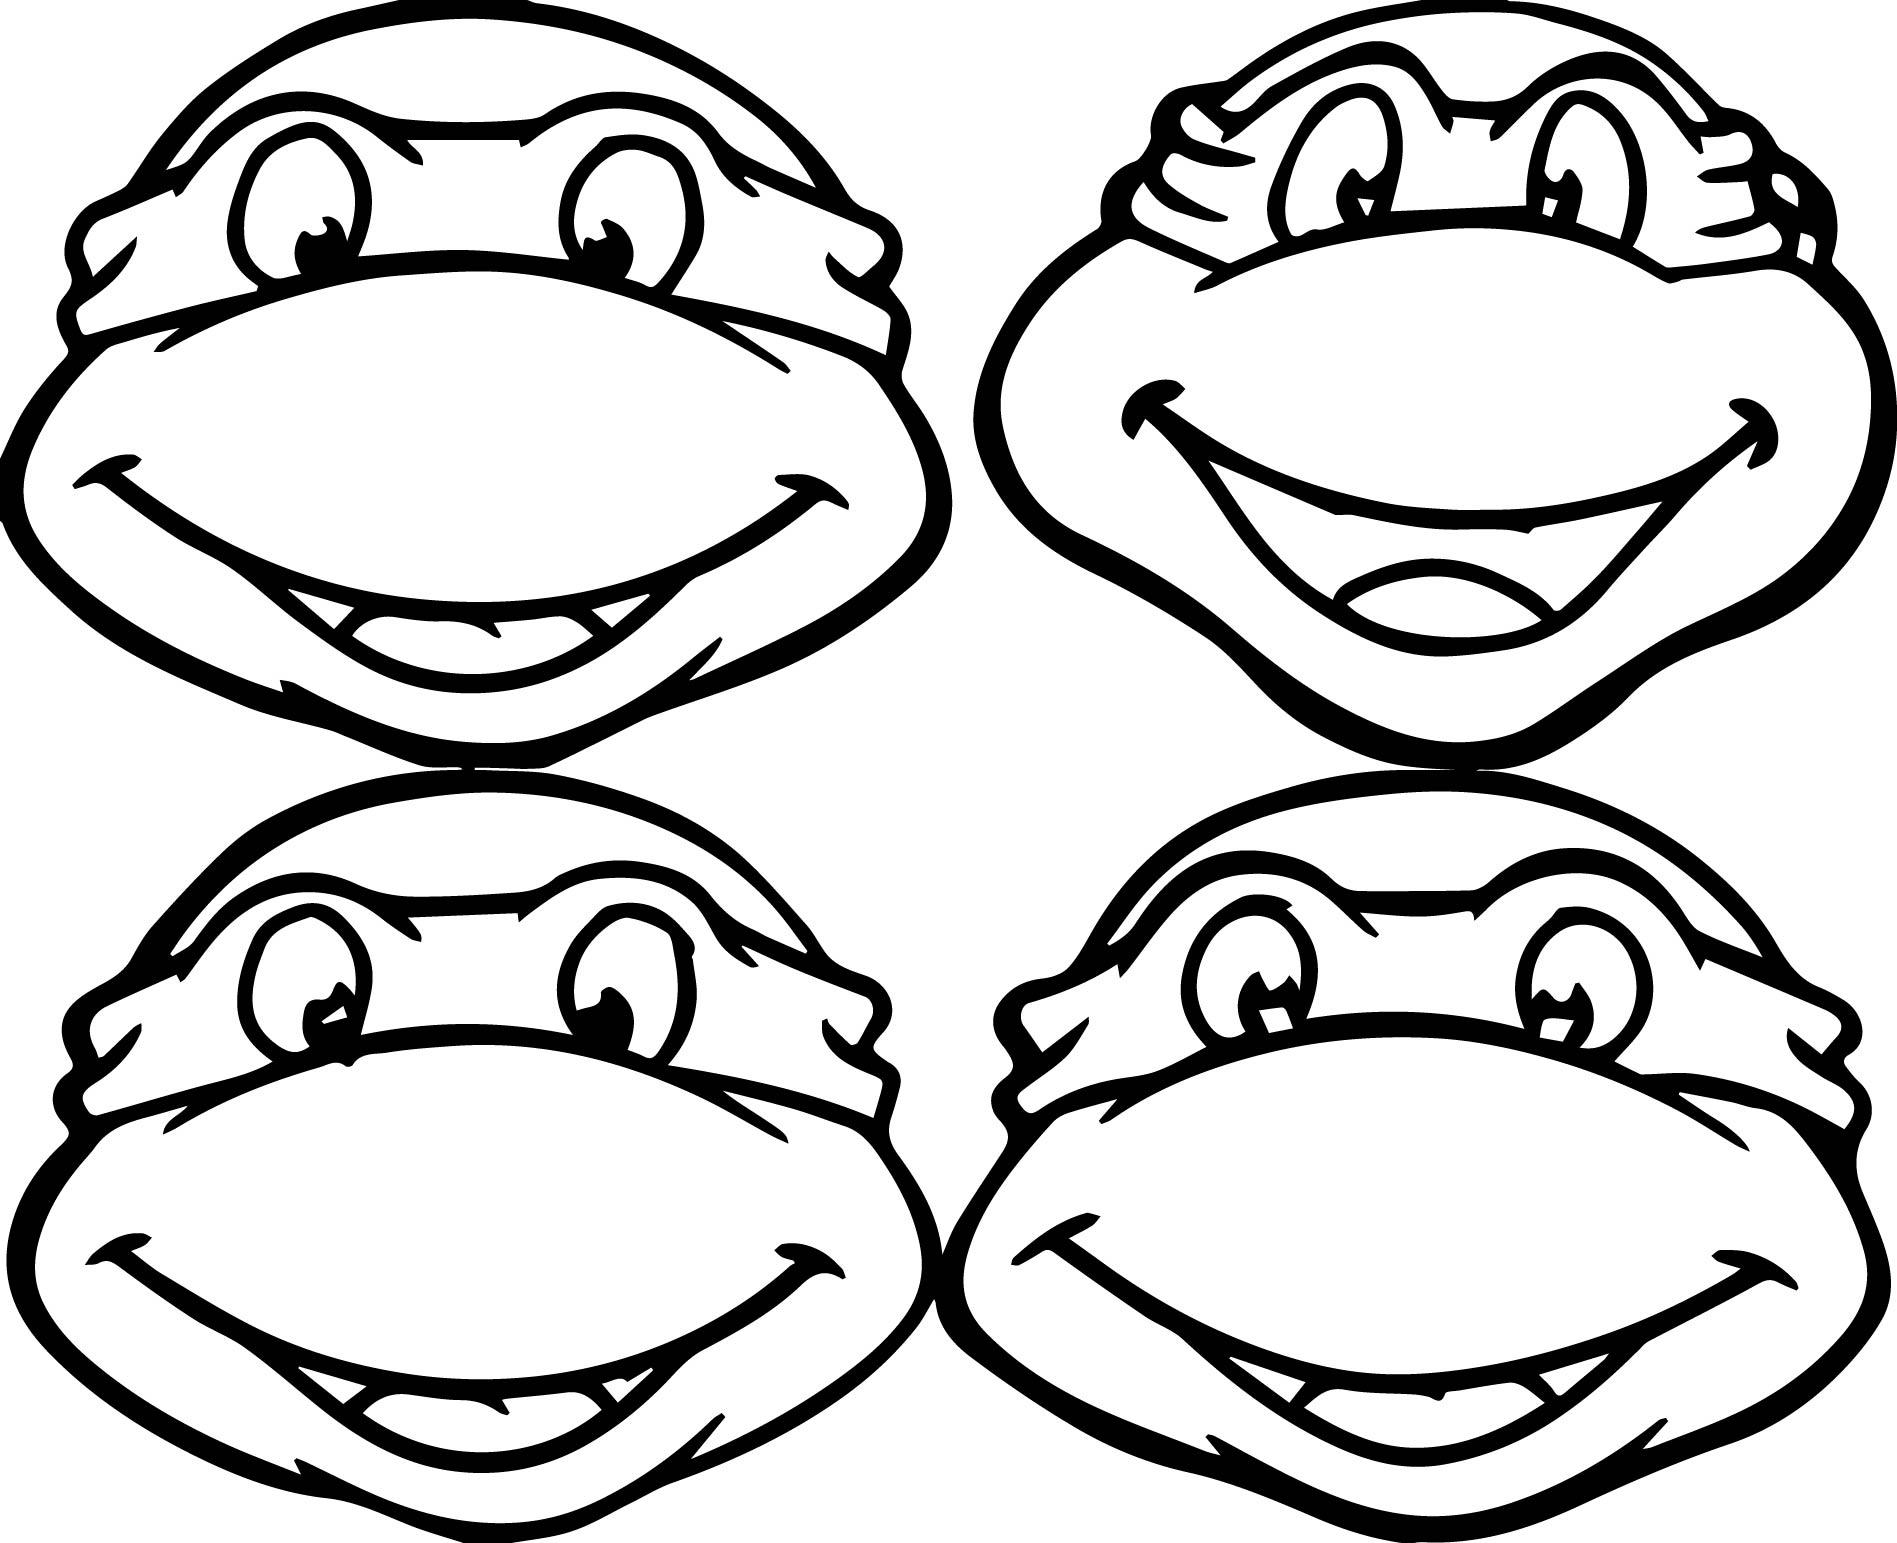 Leonardo Ninja Turtle Drawing at GetDrawings | Free download